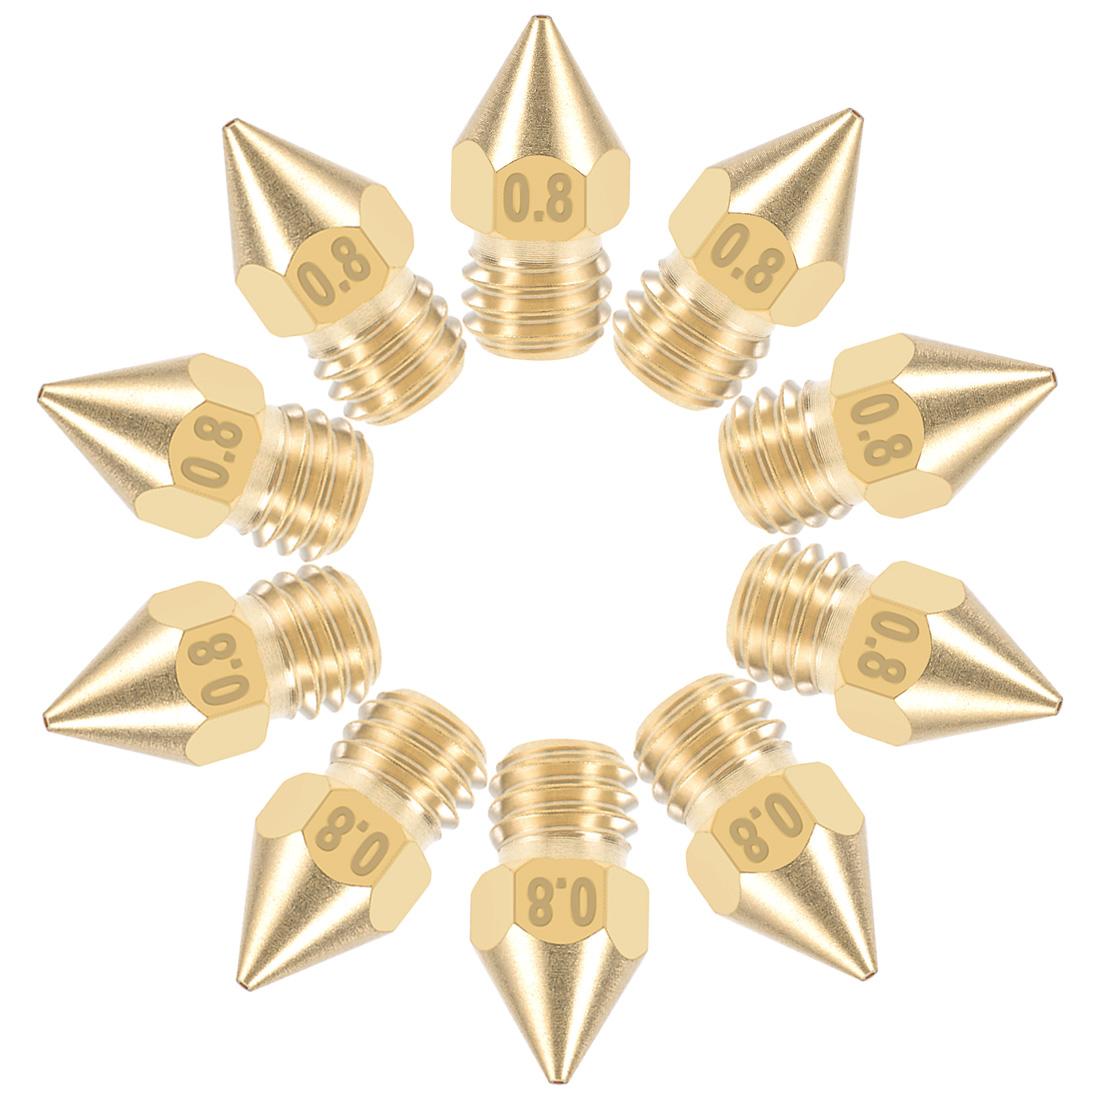 0.8mm 3D Printer Nozzle Head M6 Thread MK8 1.75mm Extruder Print Brass 10pcs